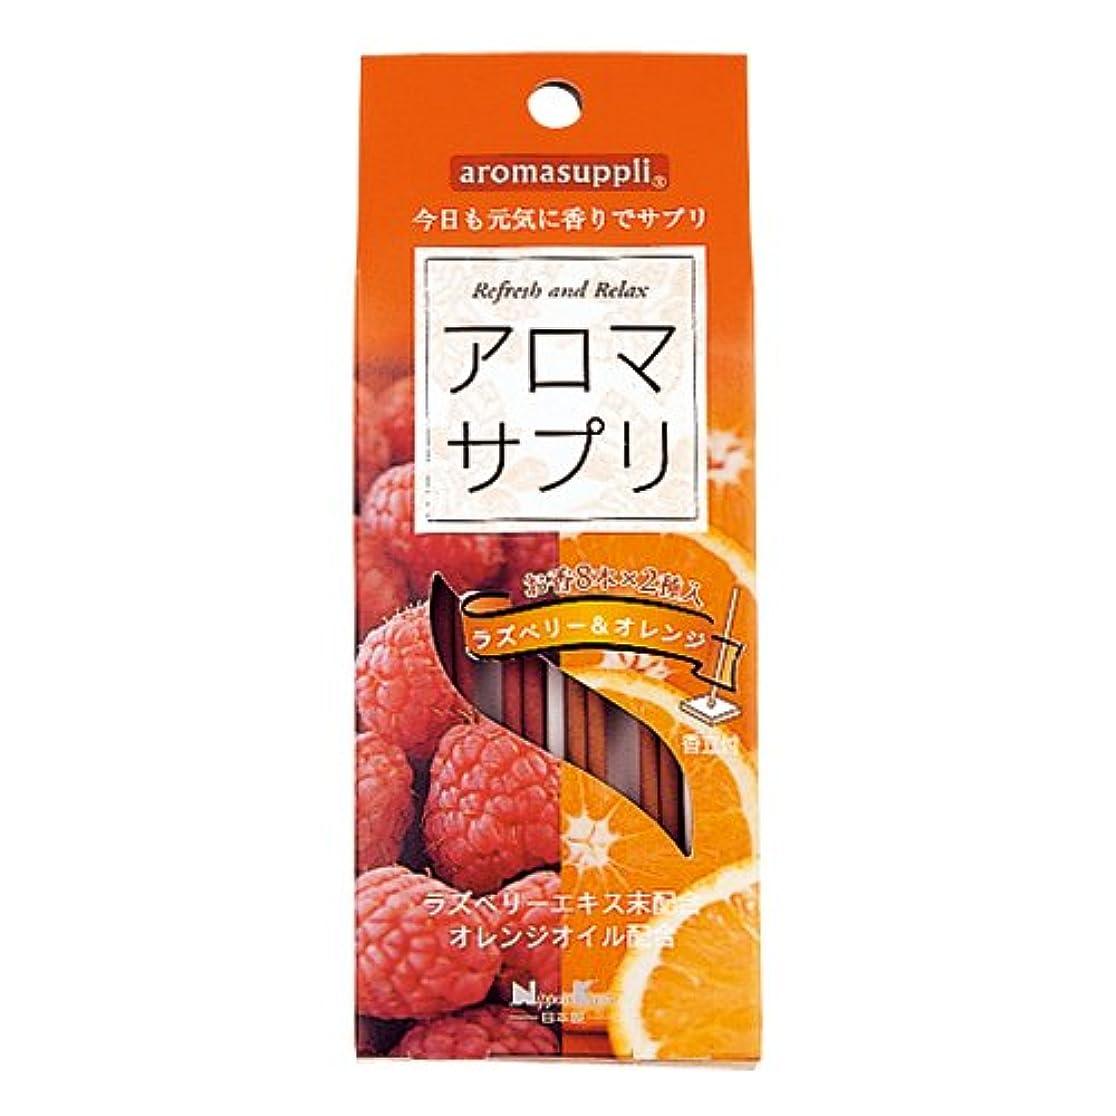 【X5個セット】 アロマサプリ ラズベリー&オレンジ 8本入×2種